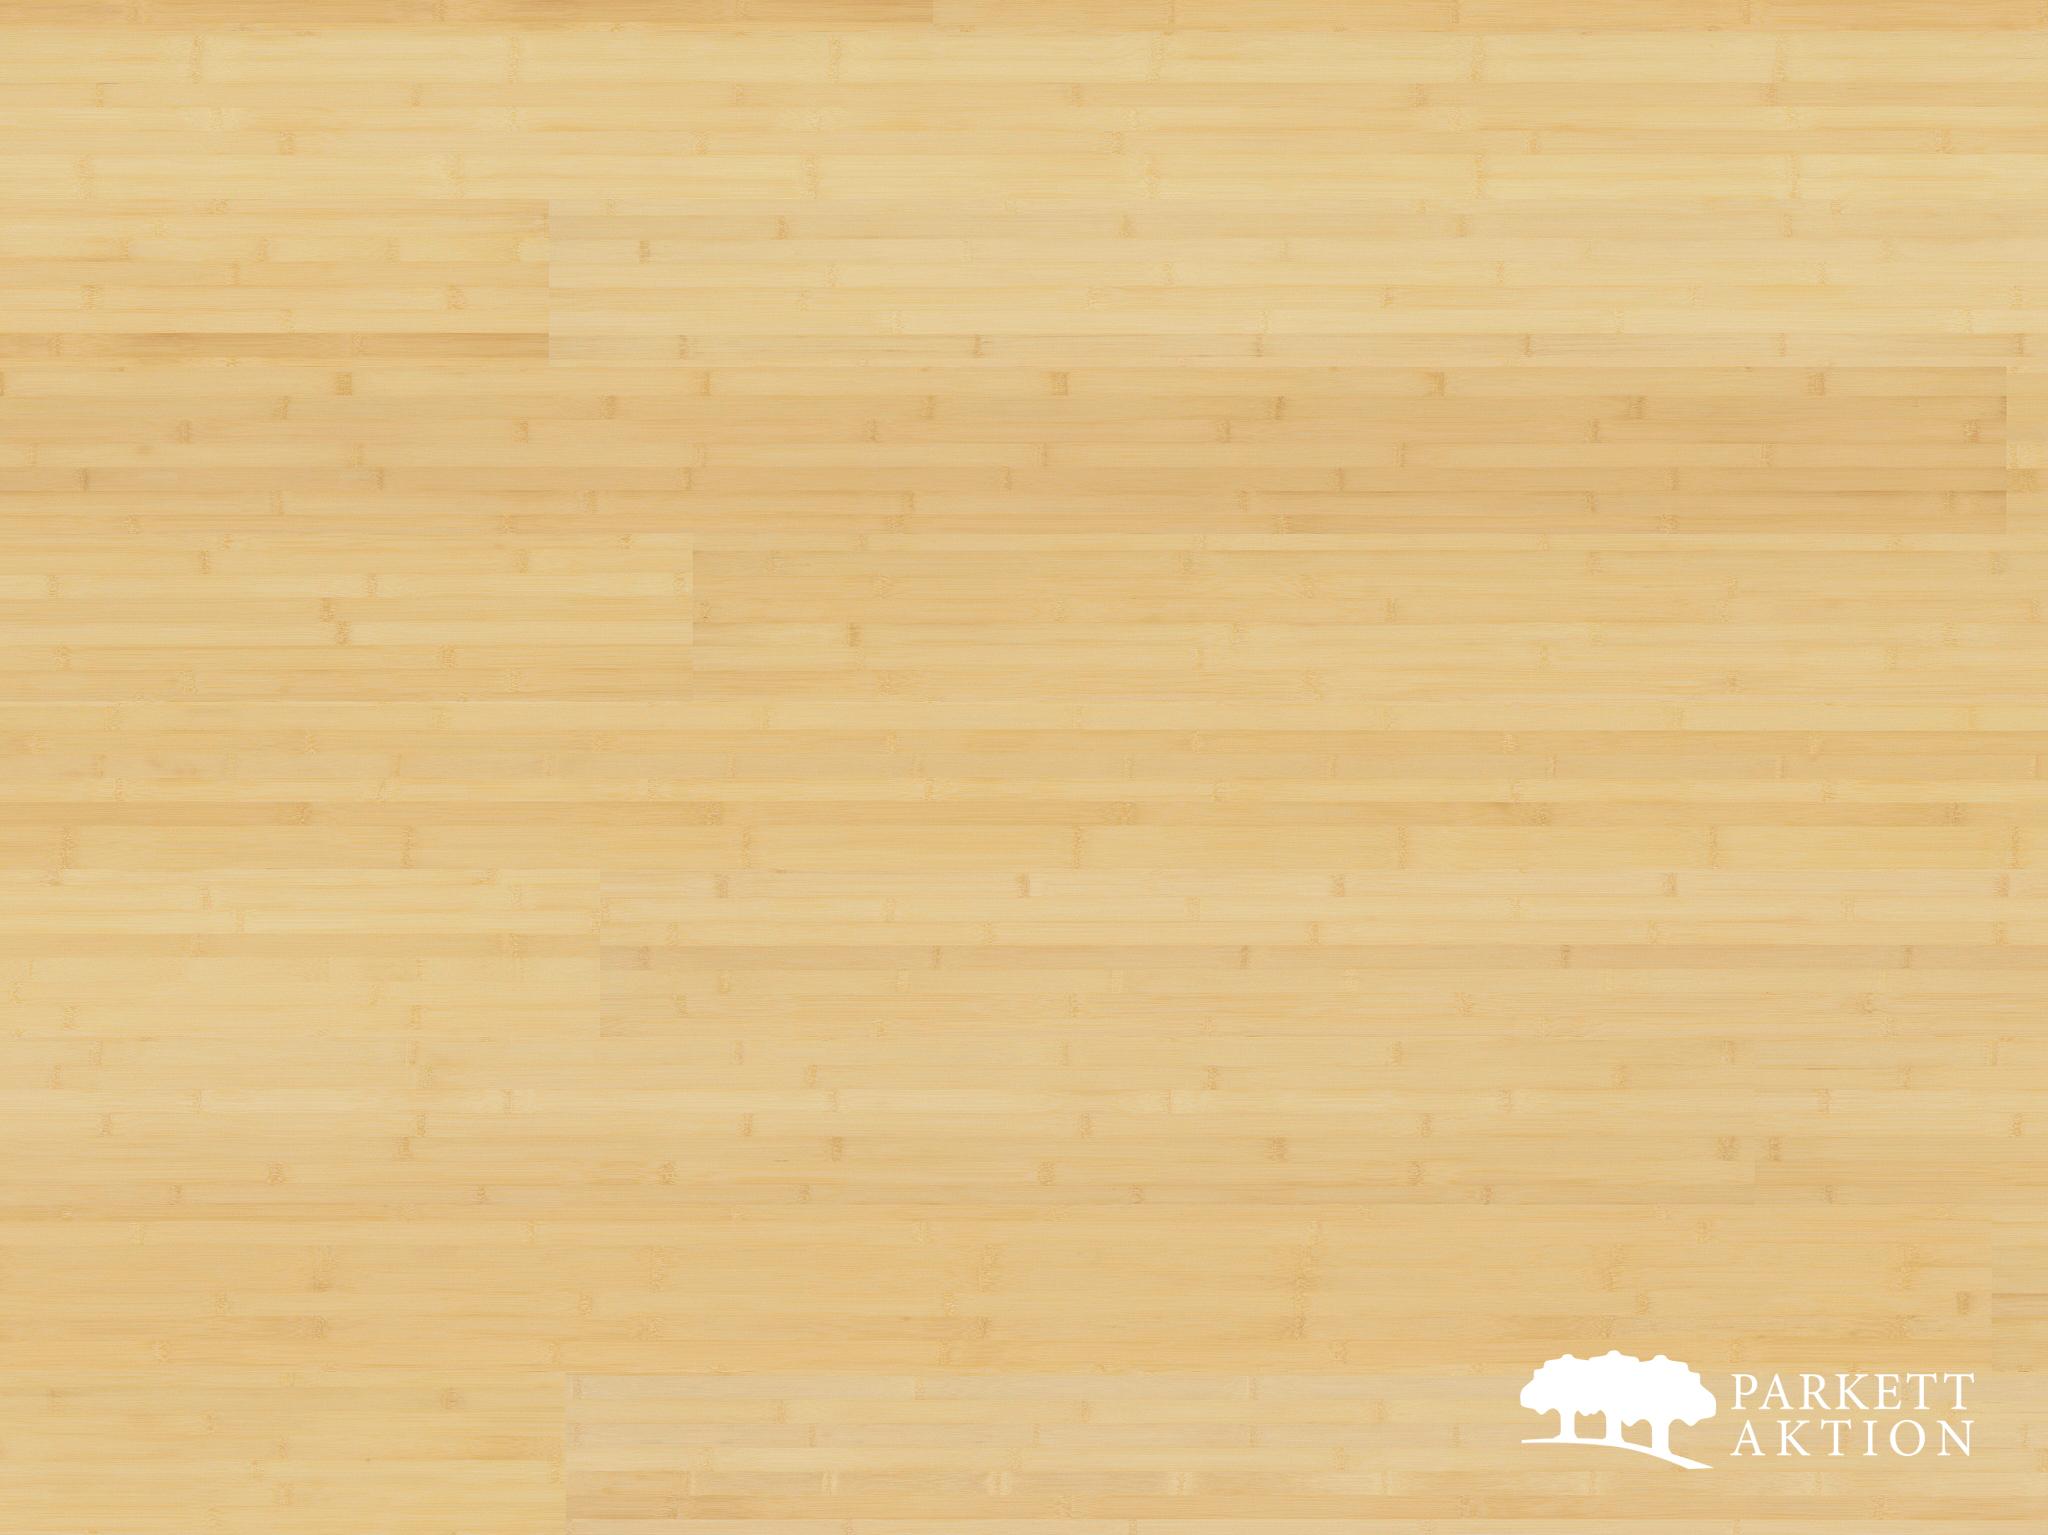 Extrem Bambusparkett naturhell lackiert - Parkett Aktion - DE - parkett AE74